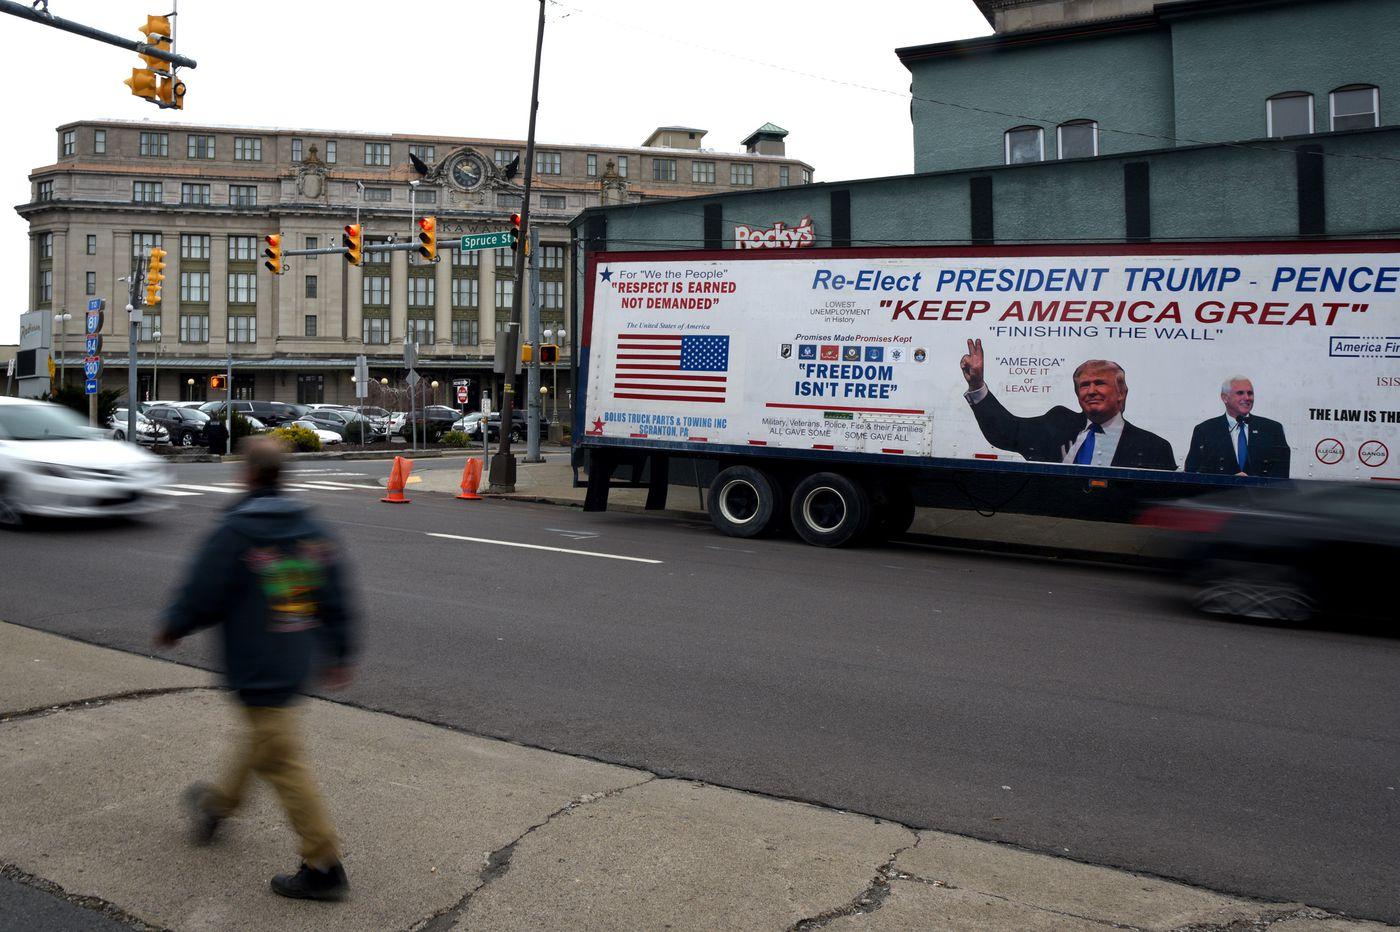 Donald Trump S Fox News Town Hall In Scranton Trolls Joe Biden In His Pa Hometown